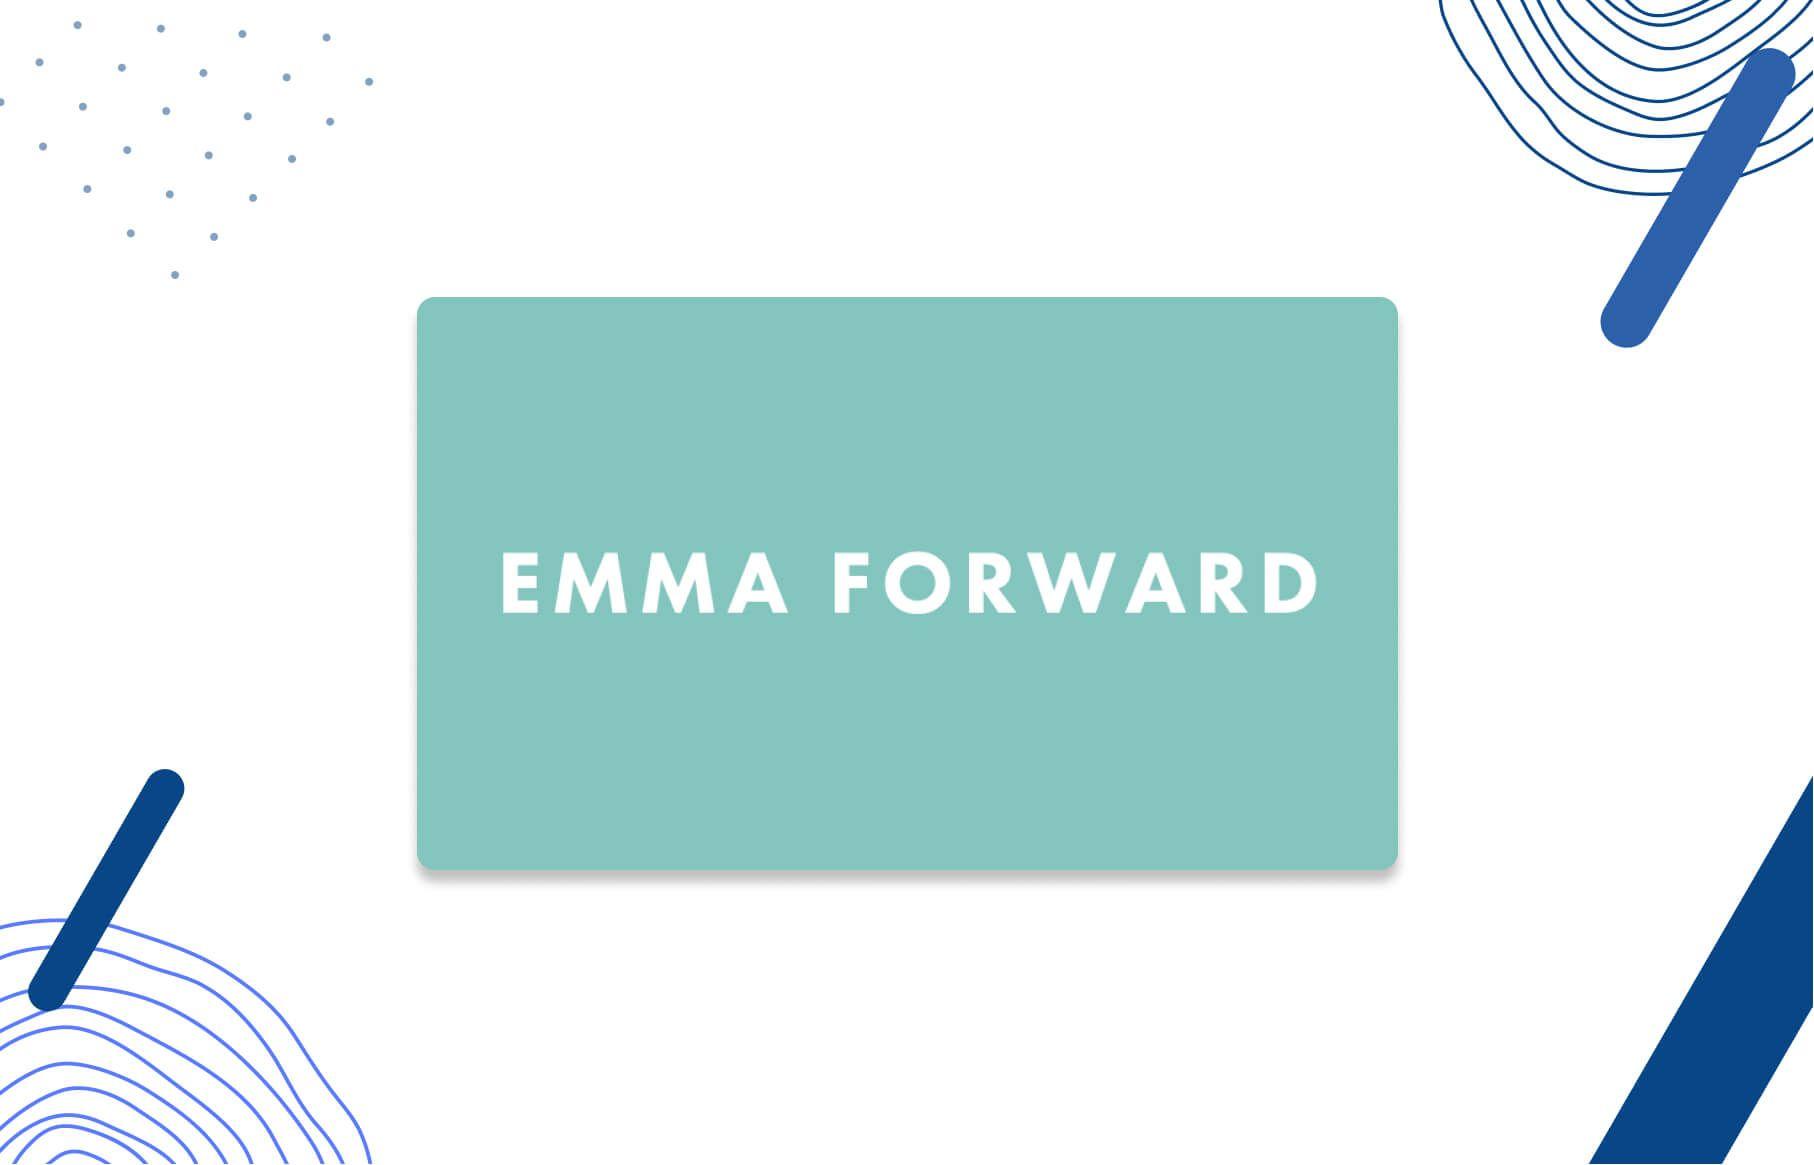 Emma Forward Logo - Increase profitability online through eCommerce strategy